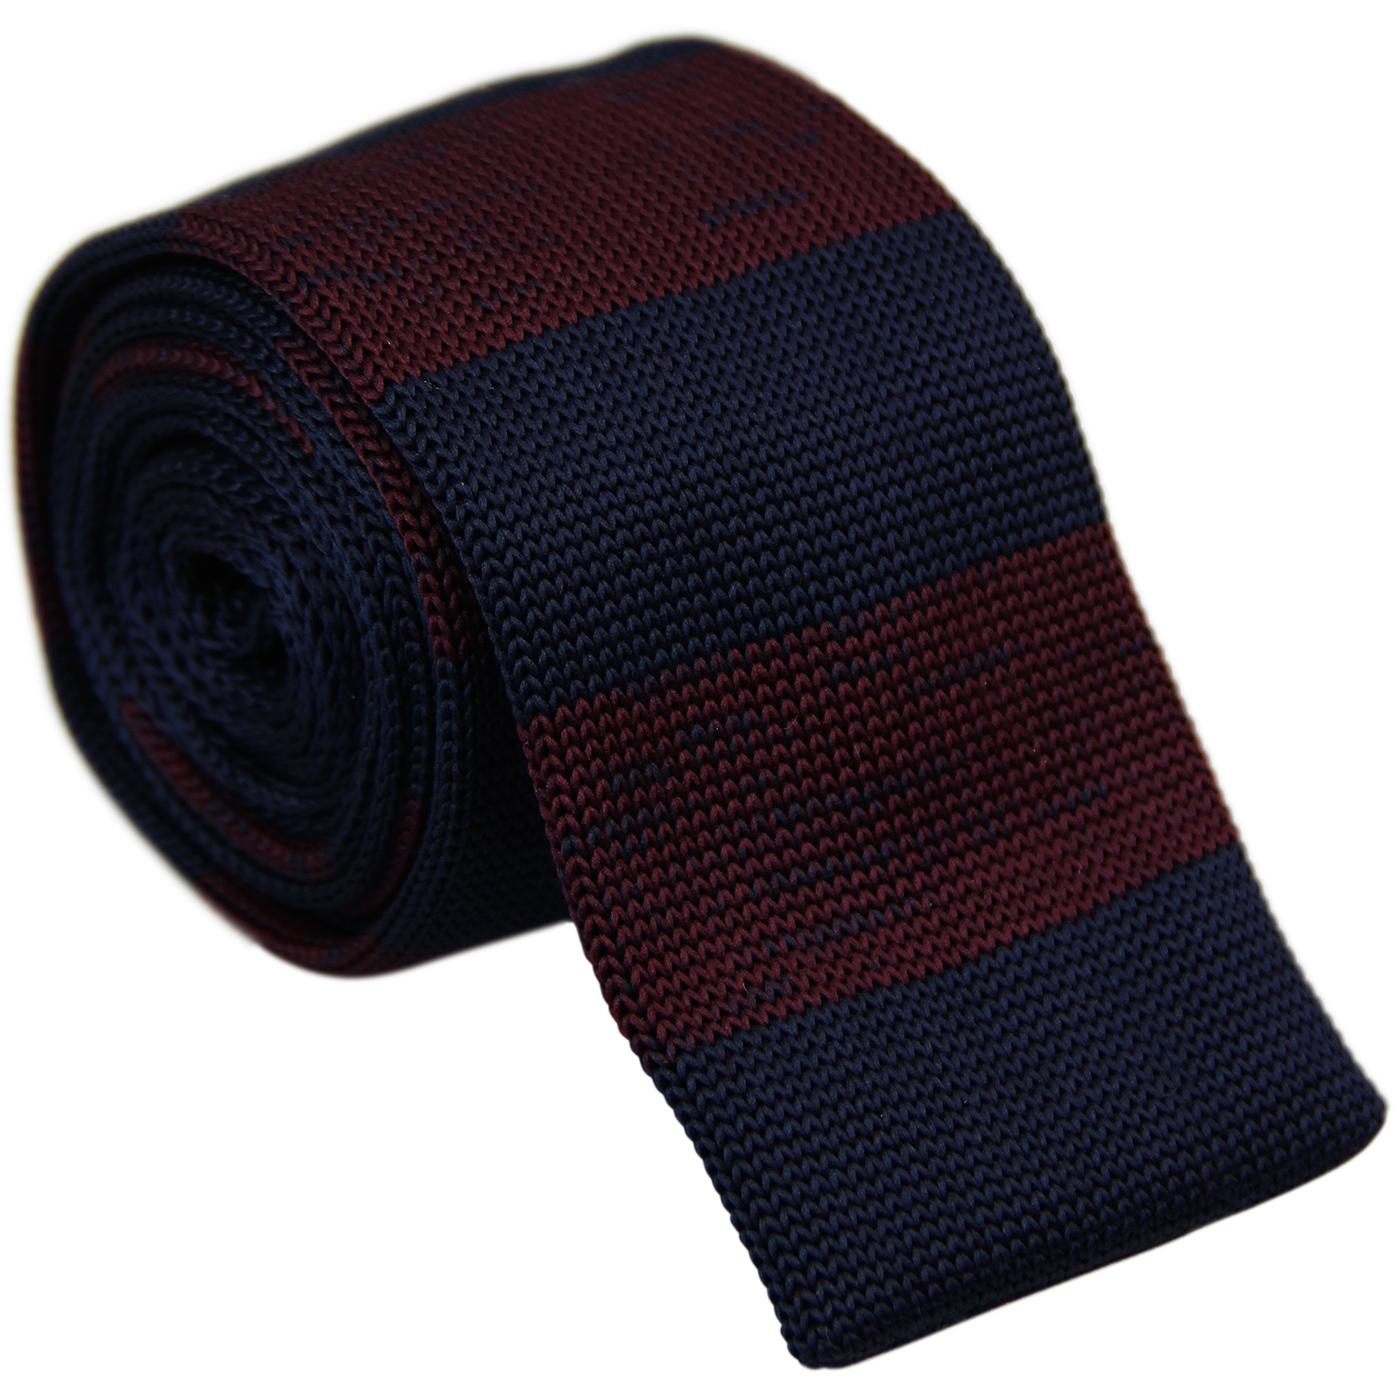 GIBSON LONDON Mod Stripe Knitted Tie (Burgundy)